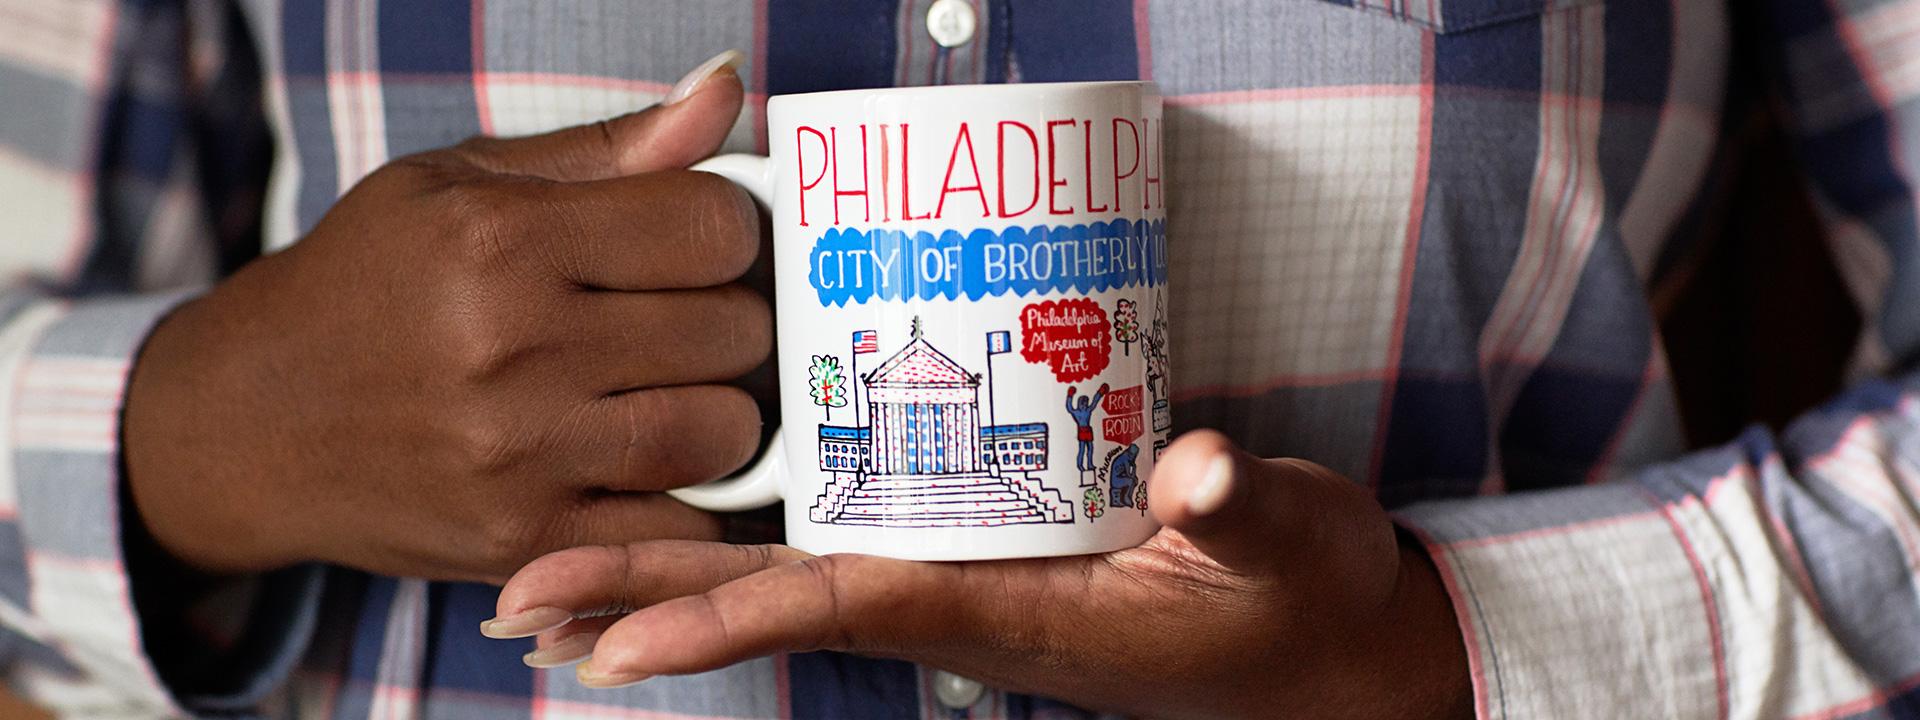 Person holding a Philadelphia coffee mug